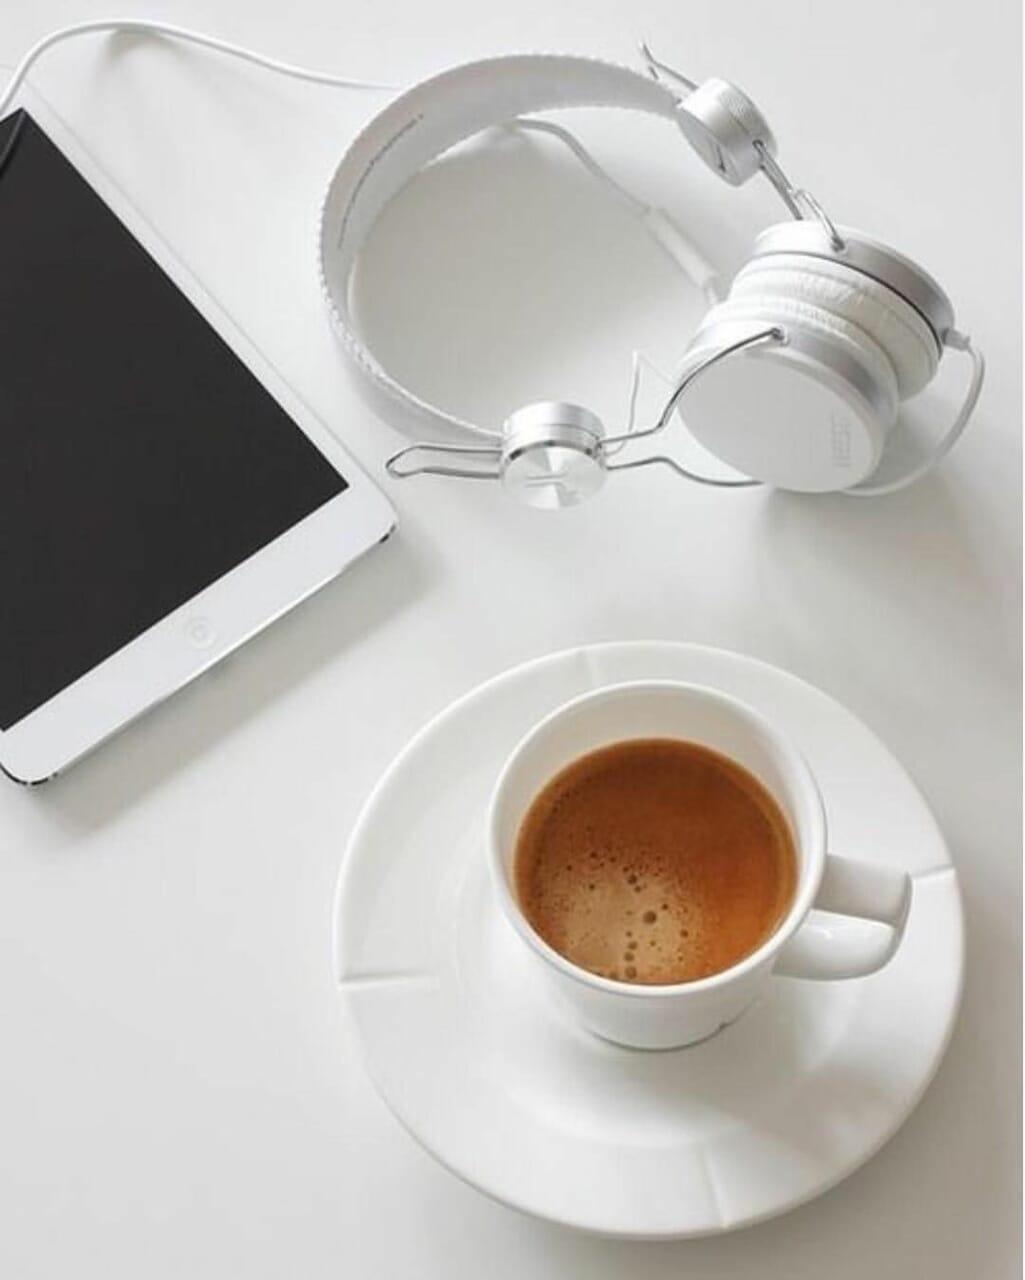 coffe image